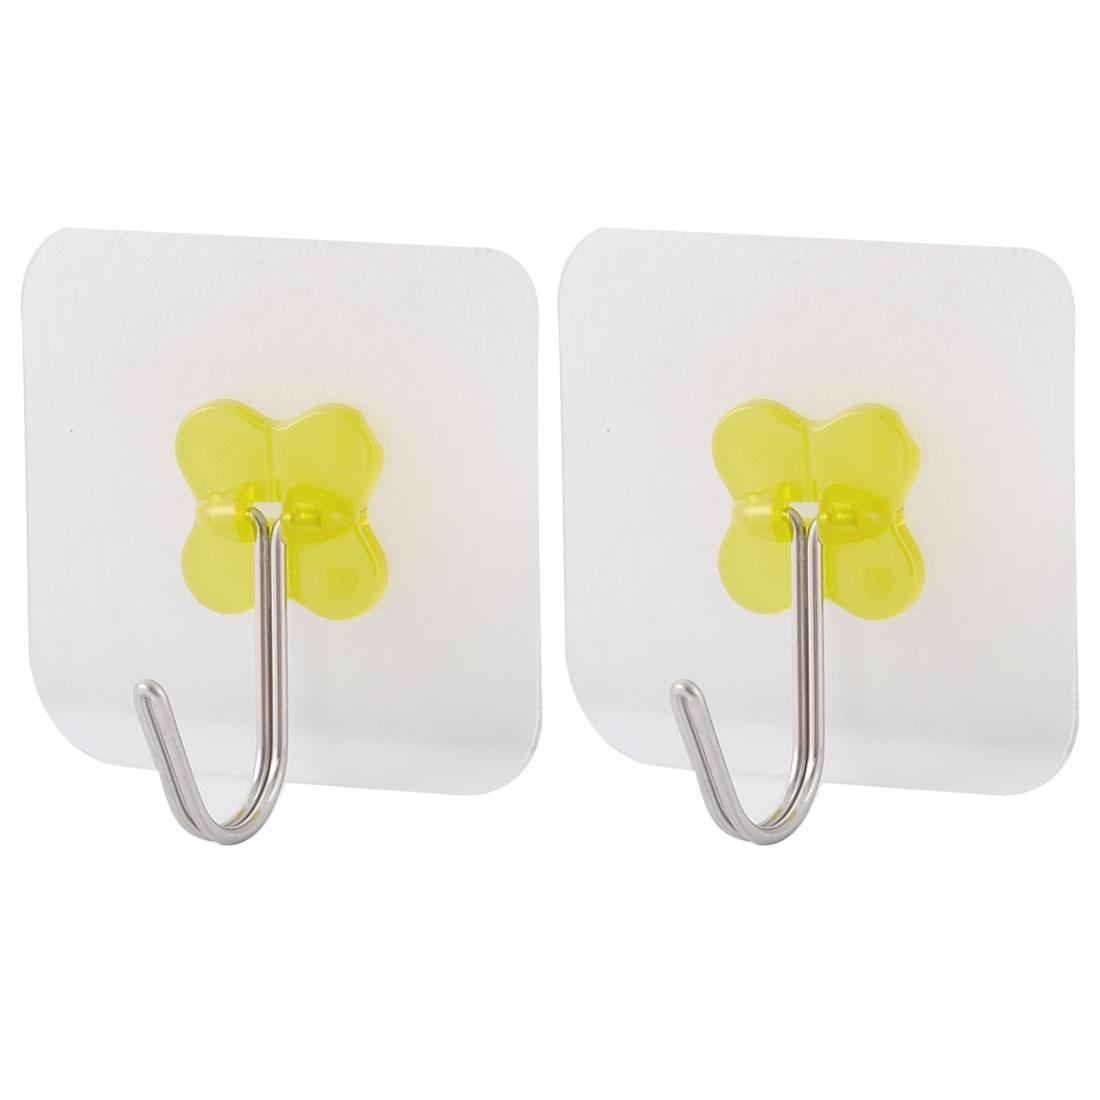 Home Door No Scratch Towel Clothes Hanger Self Adhesive Seamless Hook Yellow 2pcs